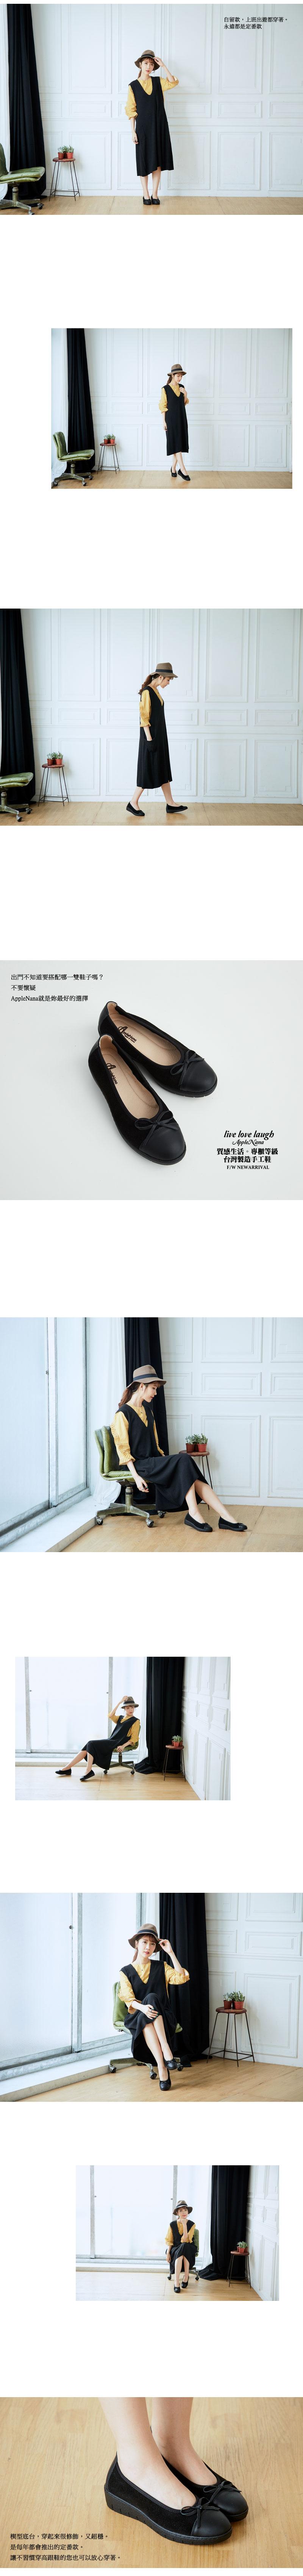 AppleNana。輕量化典雅好搭配真皮娃娃楔型氣墊鞋【QT400111480】蘋果奈奈 5